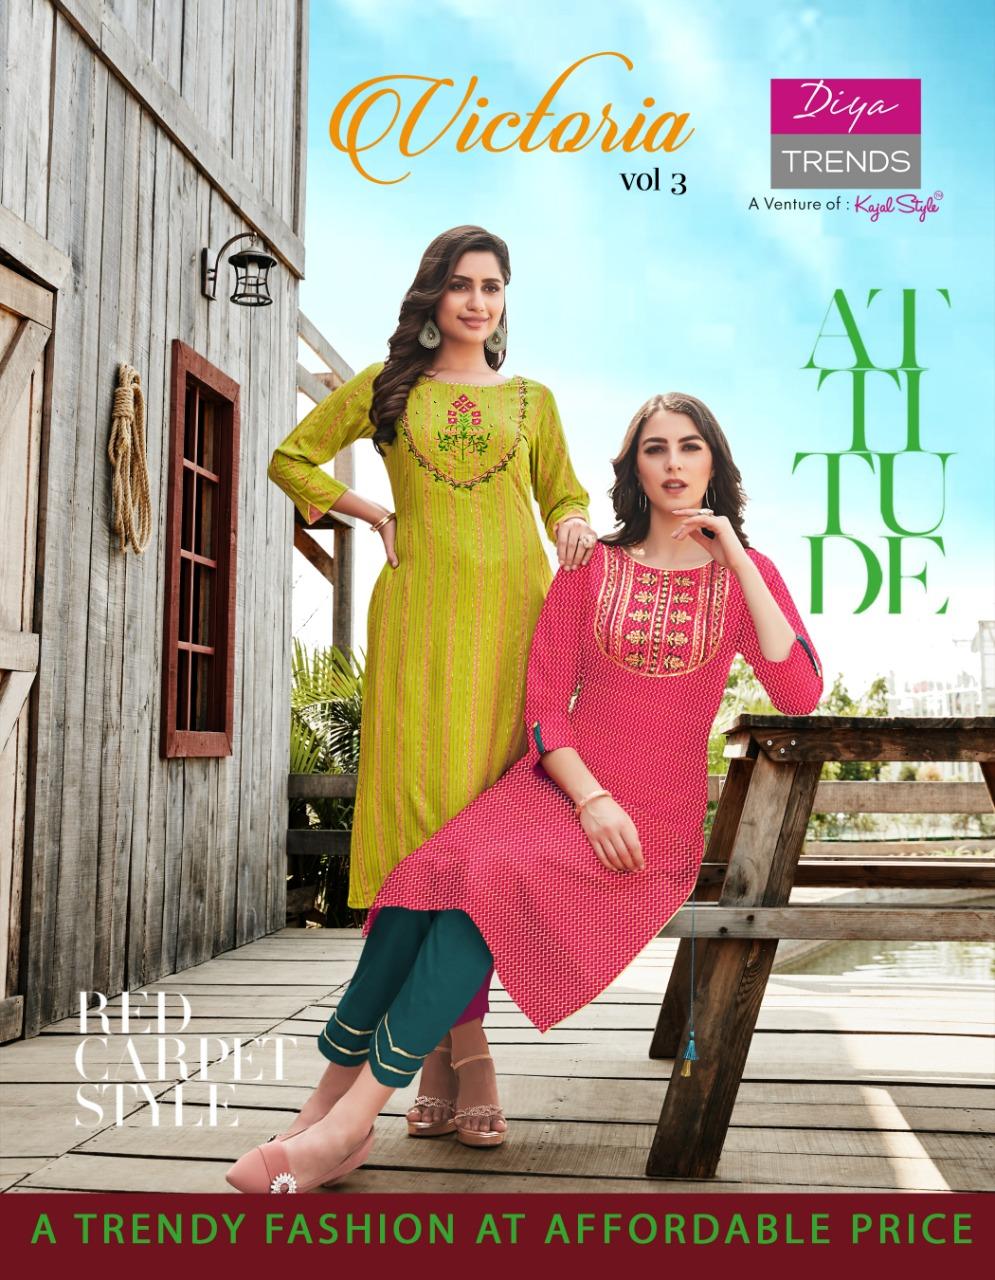 Diya Trends Victoria Vol 3 by Kajal Style Kurti Wholesale Catalog 12 Pcs 1 - Diya Trends Victoria Vol 3 by Kajal Style Kurti Wholesale Catalog 12 Pcs